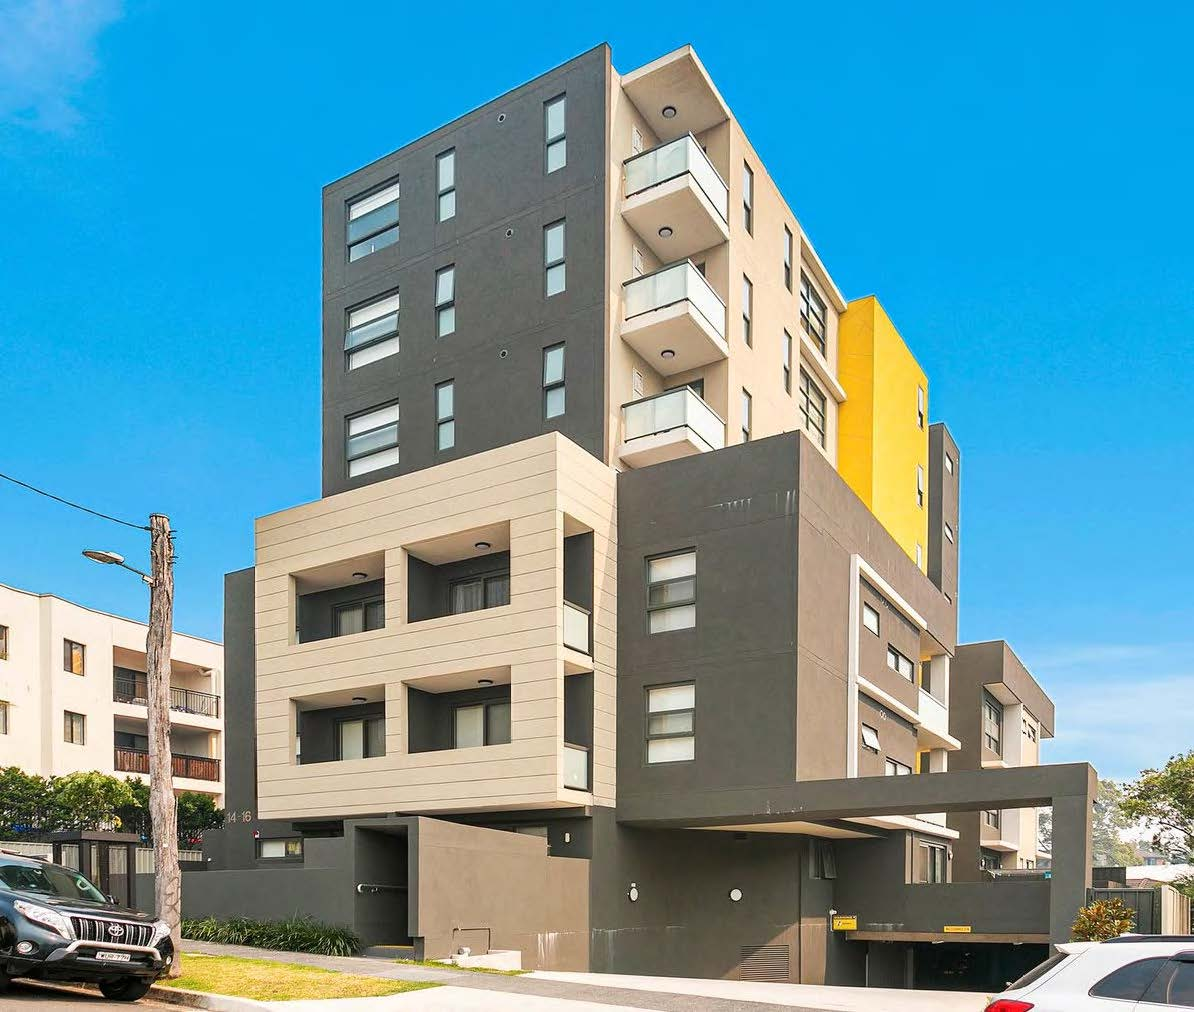 https://www.blaqprojects.com.au/wp-content/uploads/2020/08/16-Hercules-Street-Wollongong.jpg